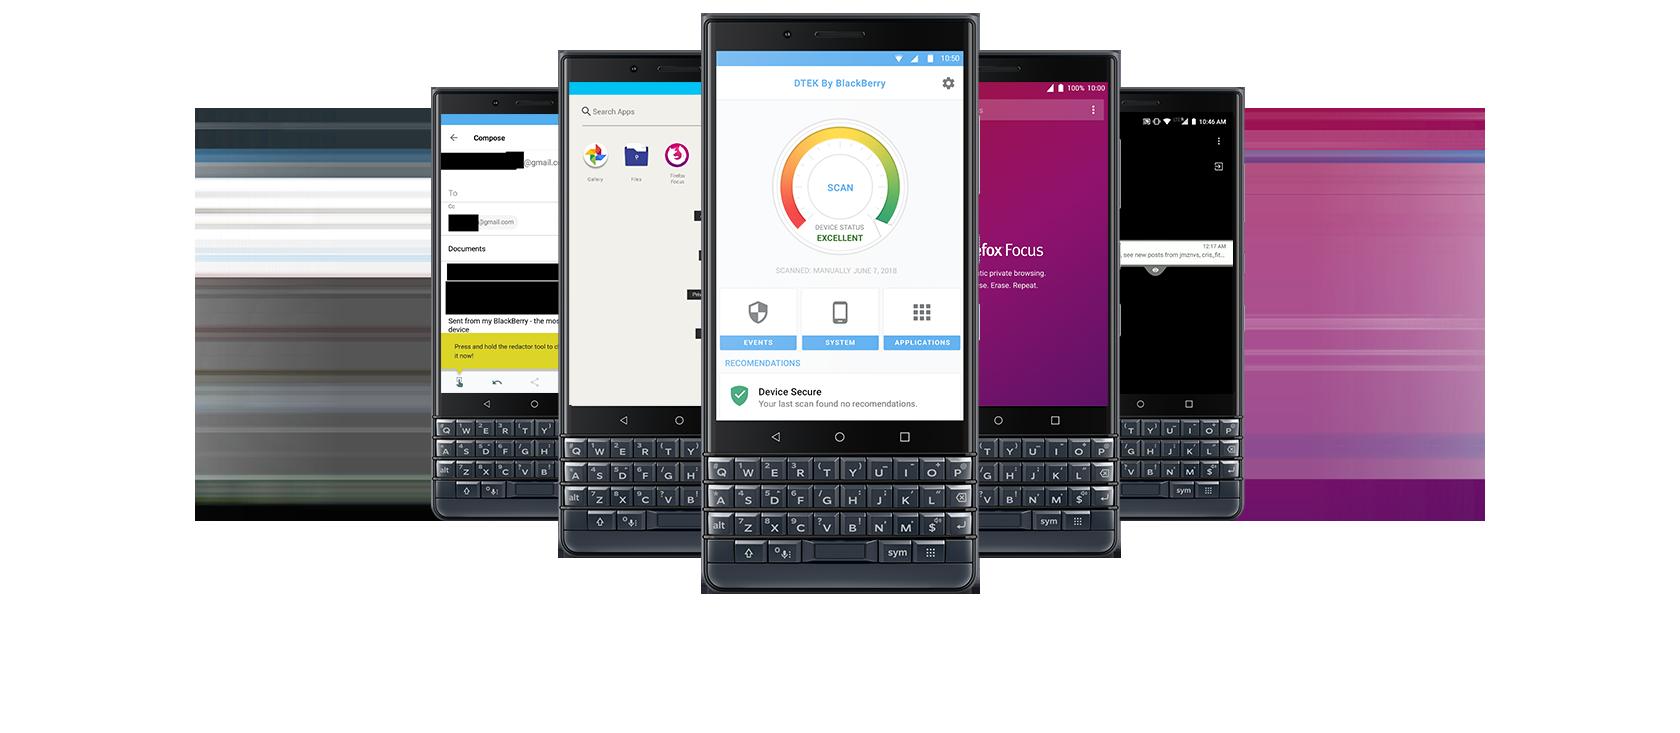 privacy blackberry key 2 le - BlackBerry KEY 2 LE